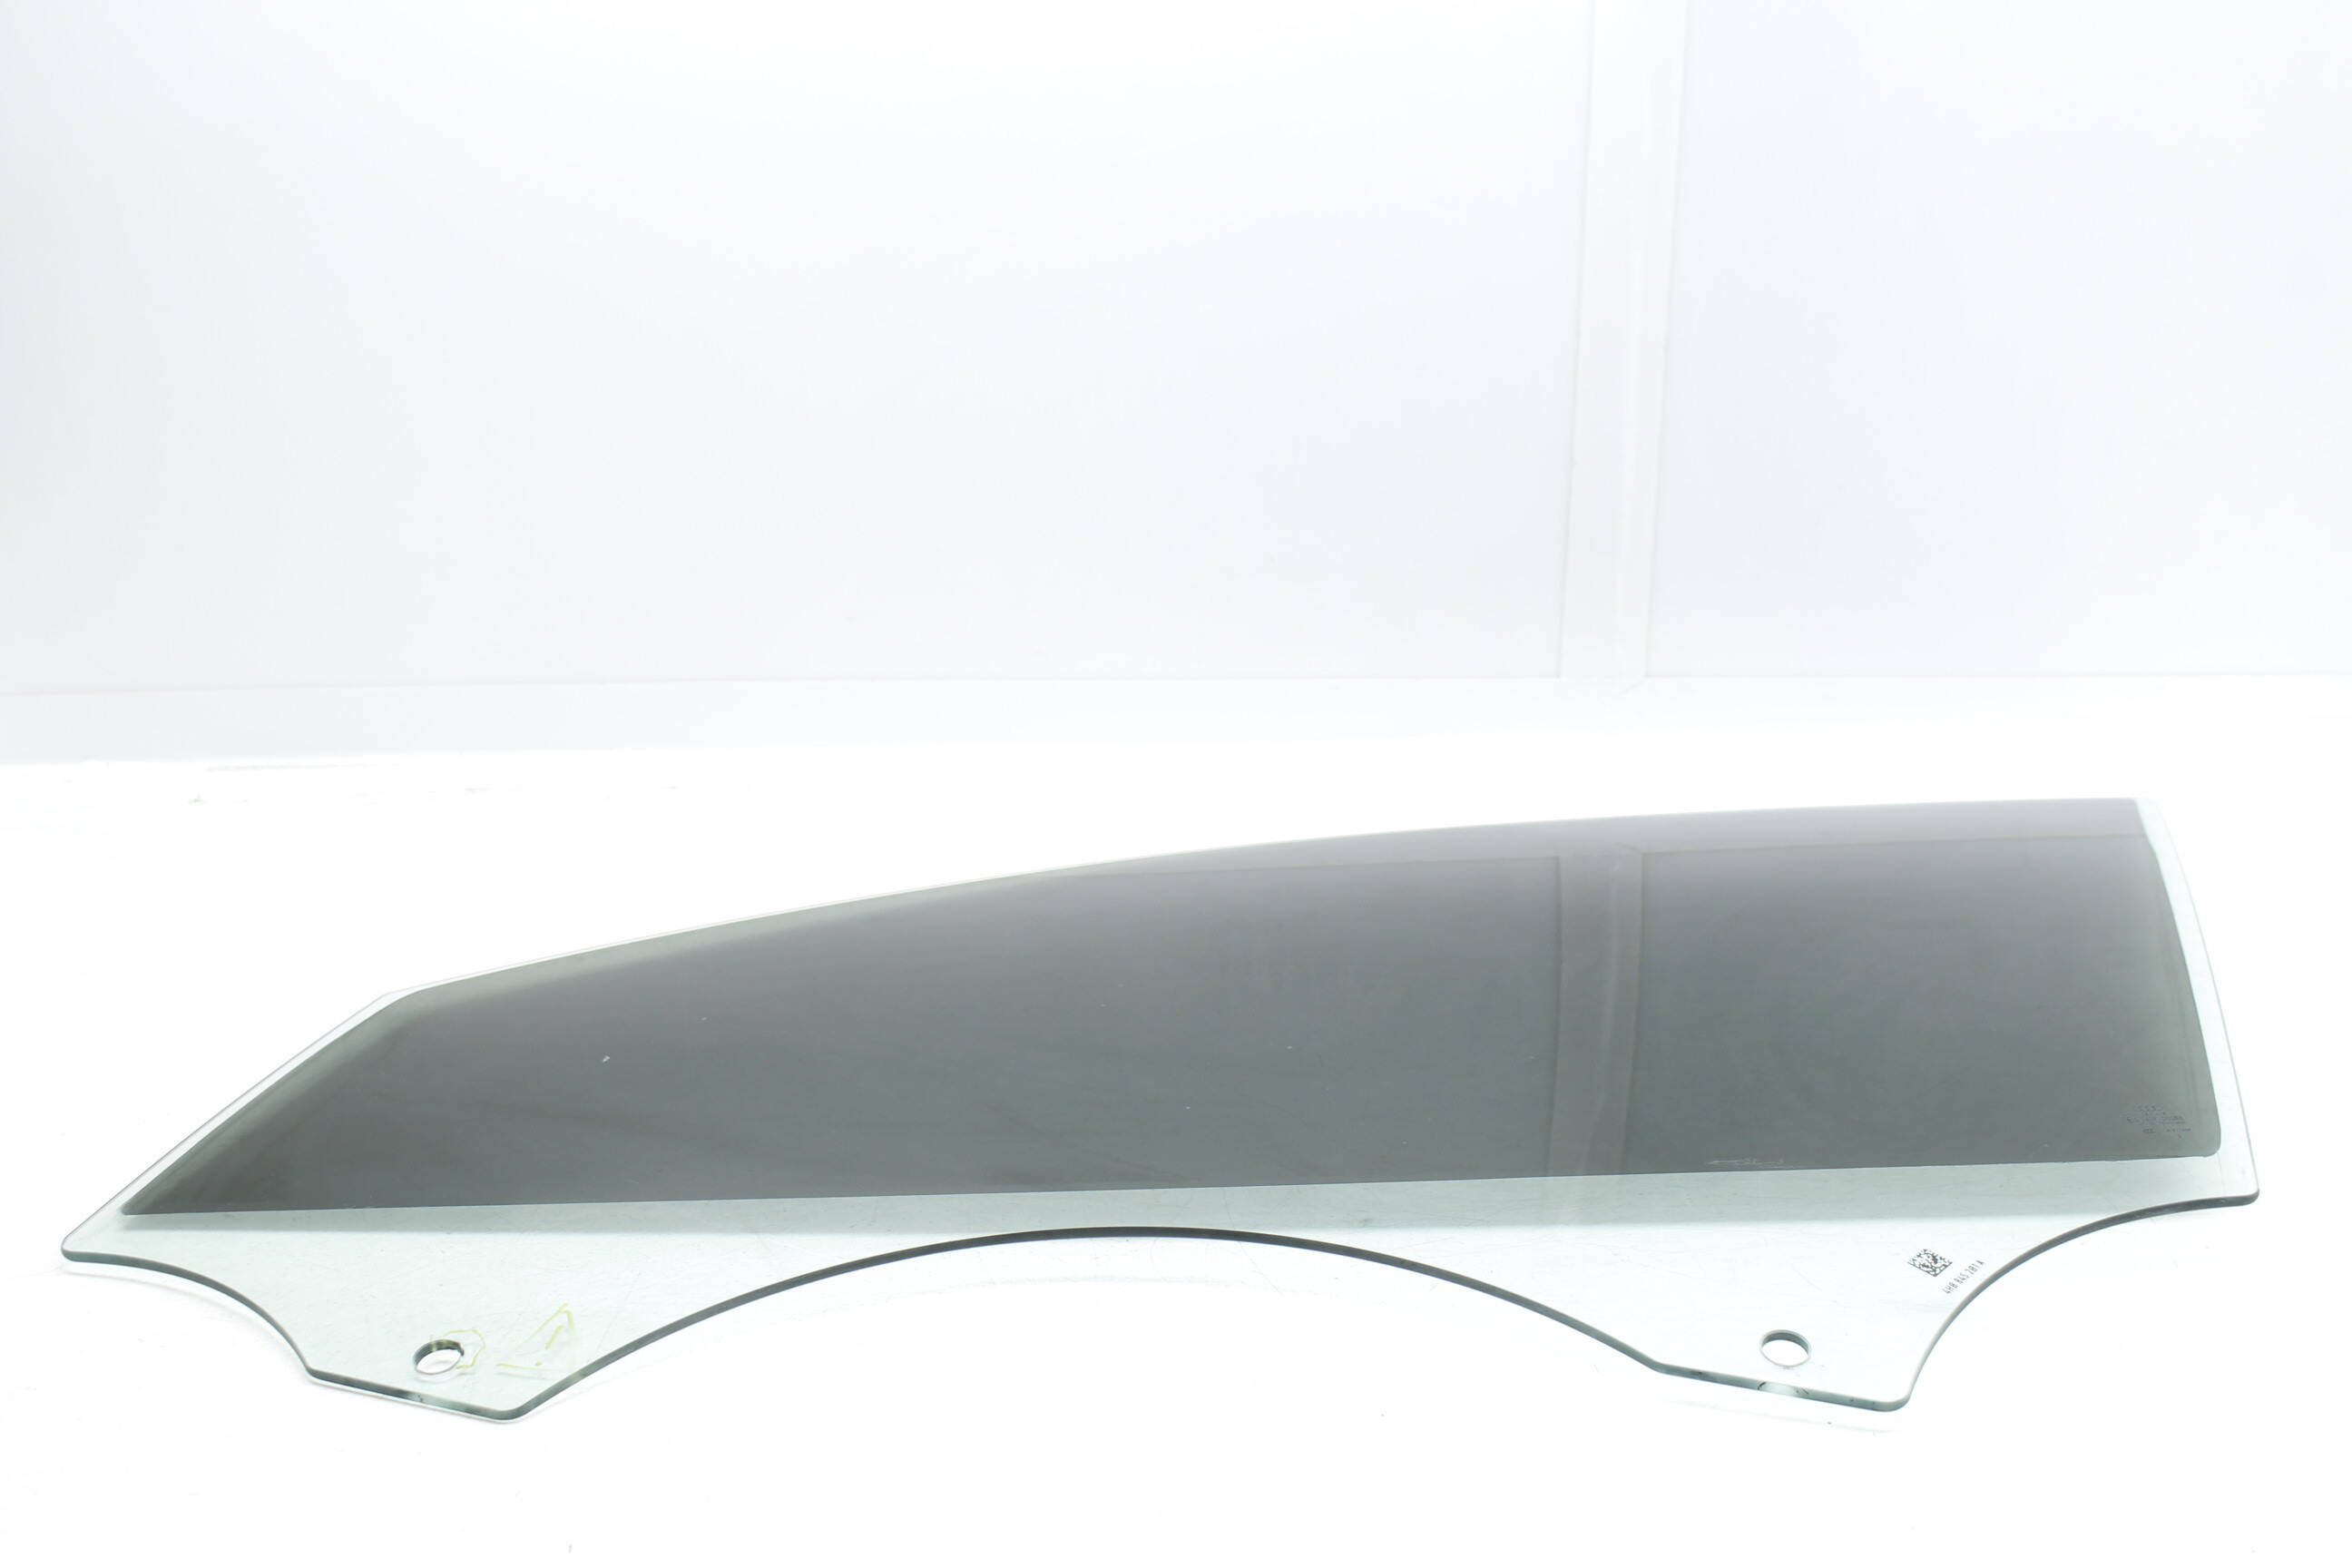 Audi A8 D4 Front Left Door Window Glass  4H0845201A NEW GENUINE